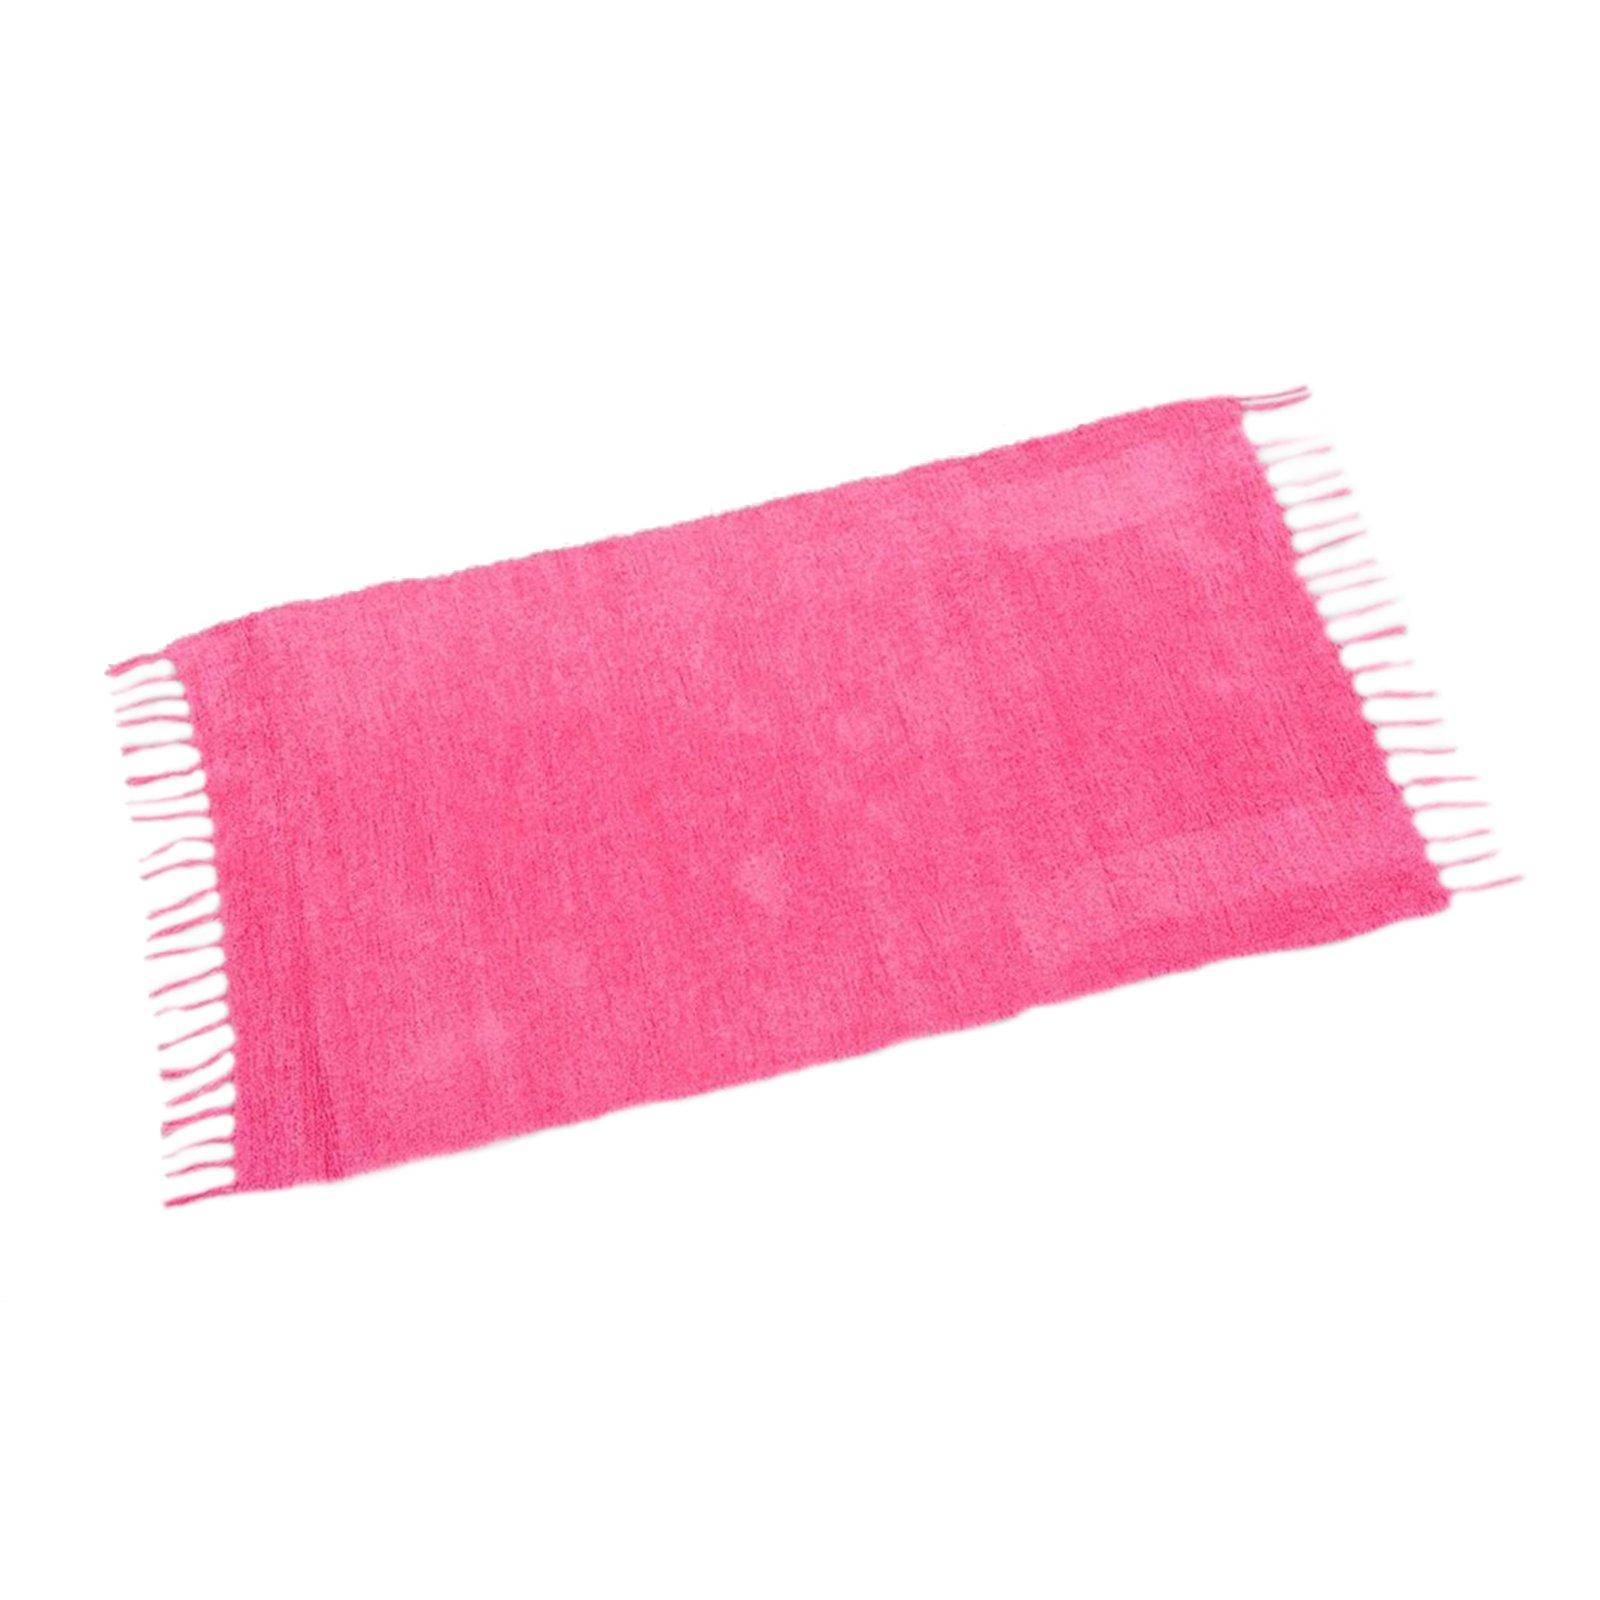 teppich chenille pink 60x110 cm einfarbige teppiche. Black Bedroom Furniture Sets. Home Design Ideas